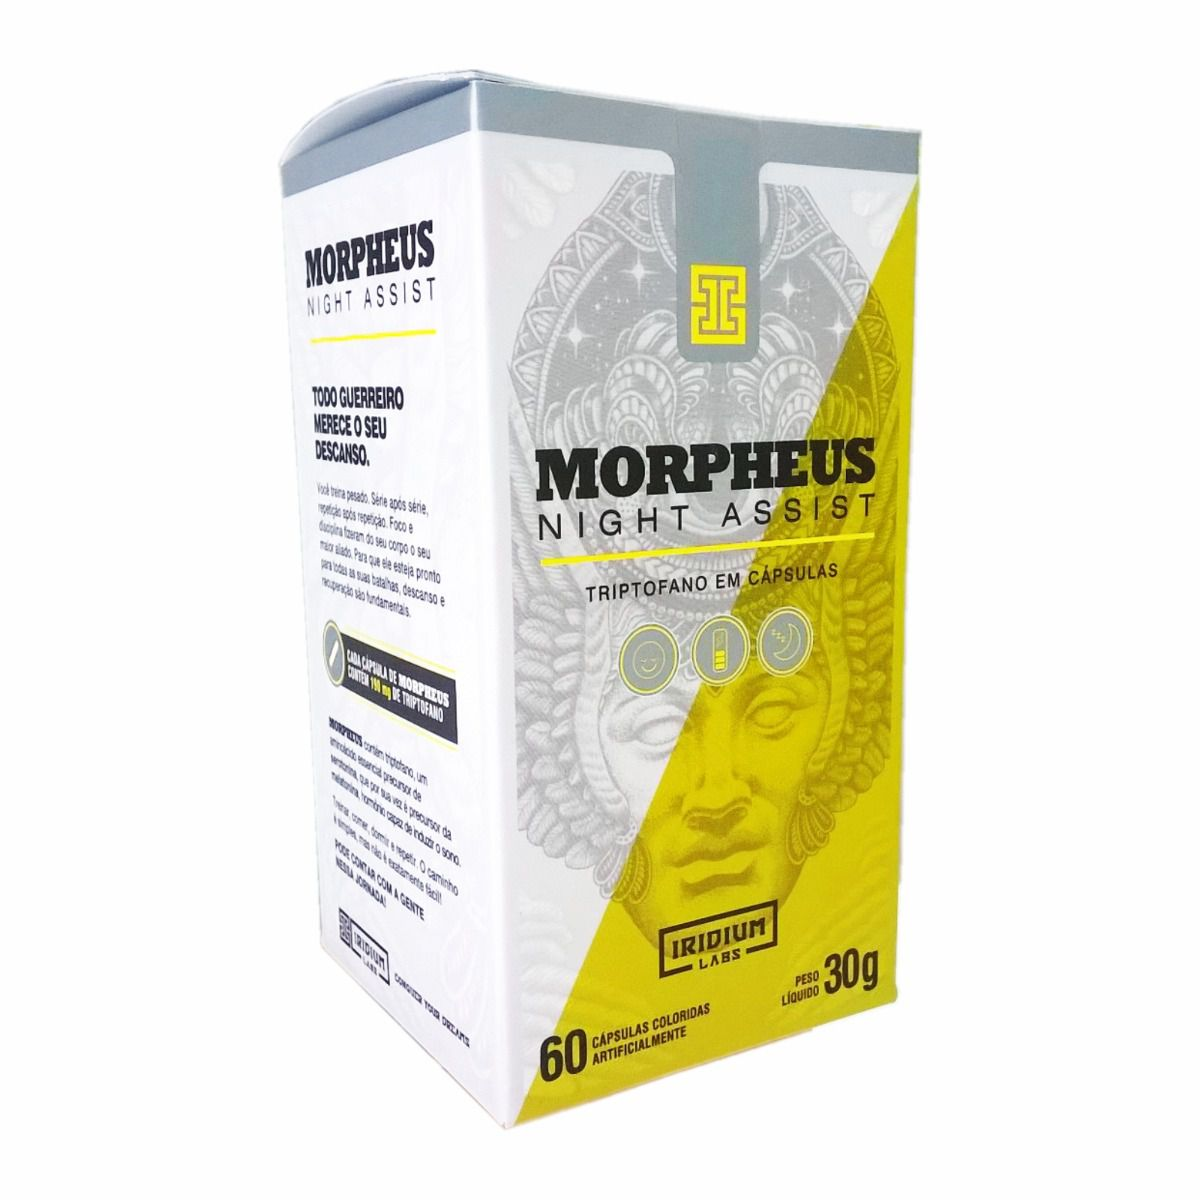 Morpheus Night Assist Iridium Labs